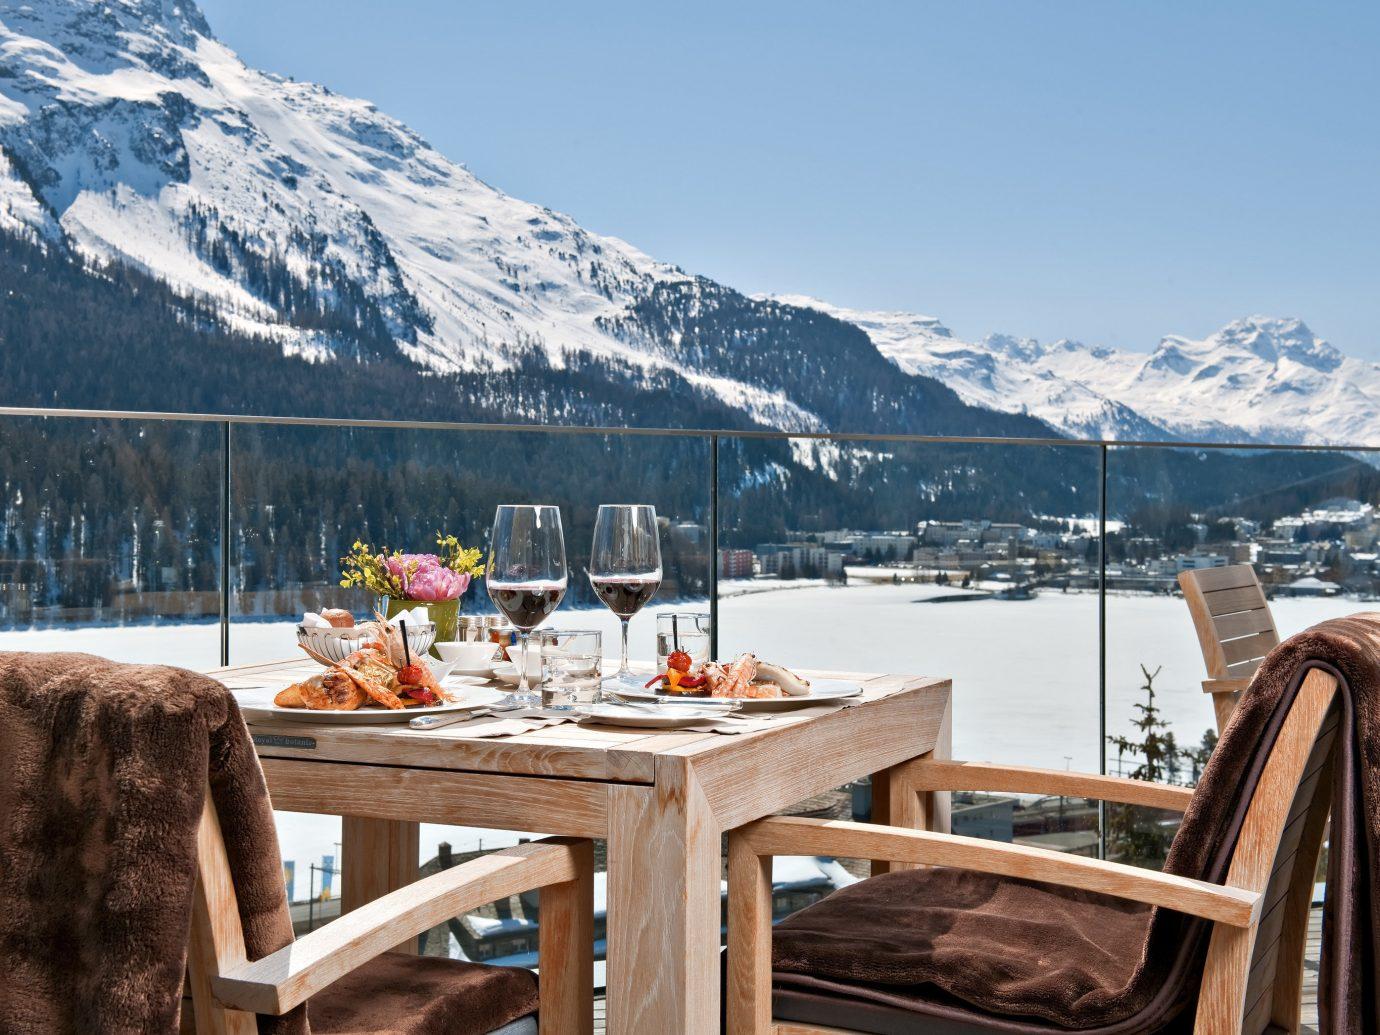 Trip Ideas sky mountain outdoor chair Winter vacation season Resort tourism snow overlooking